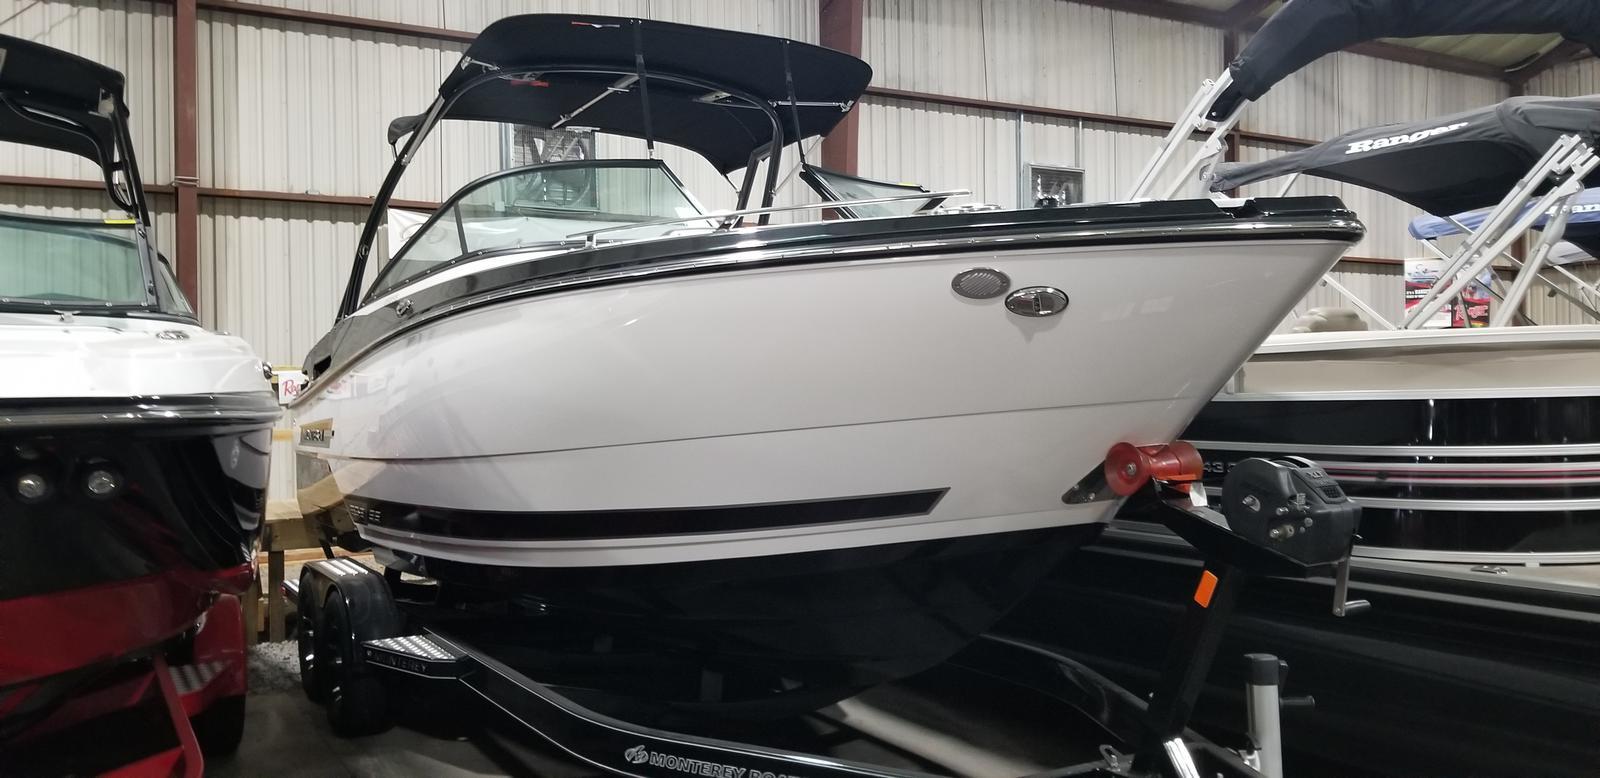 Monterey 258SS Bowrider w/ I/O Merc 6.2 300HP Cat 2.2 BR3